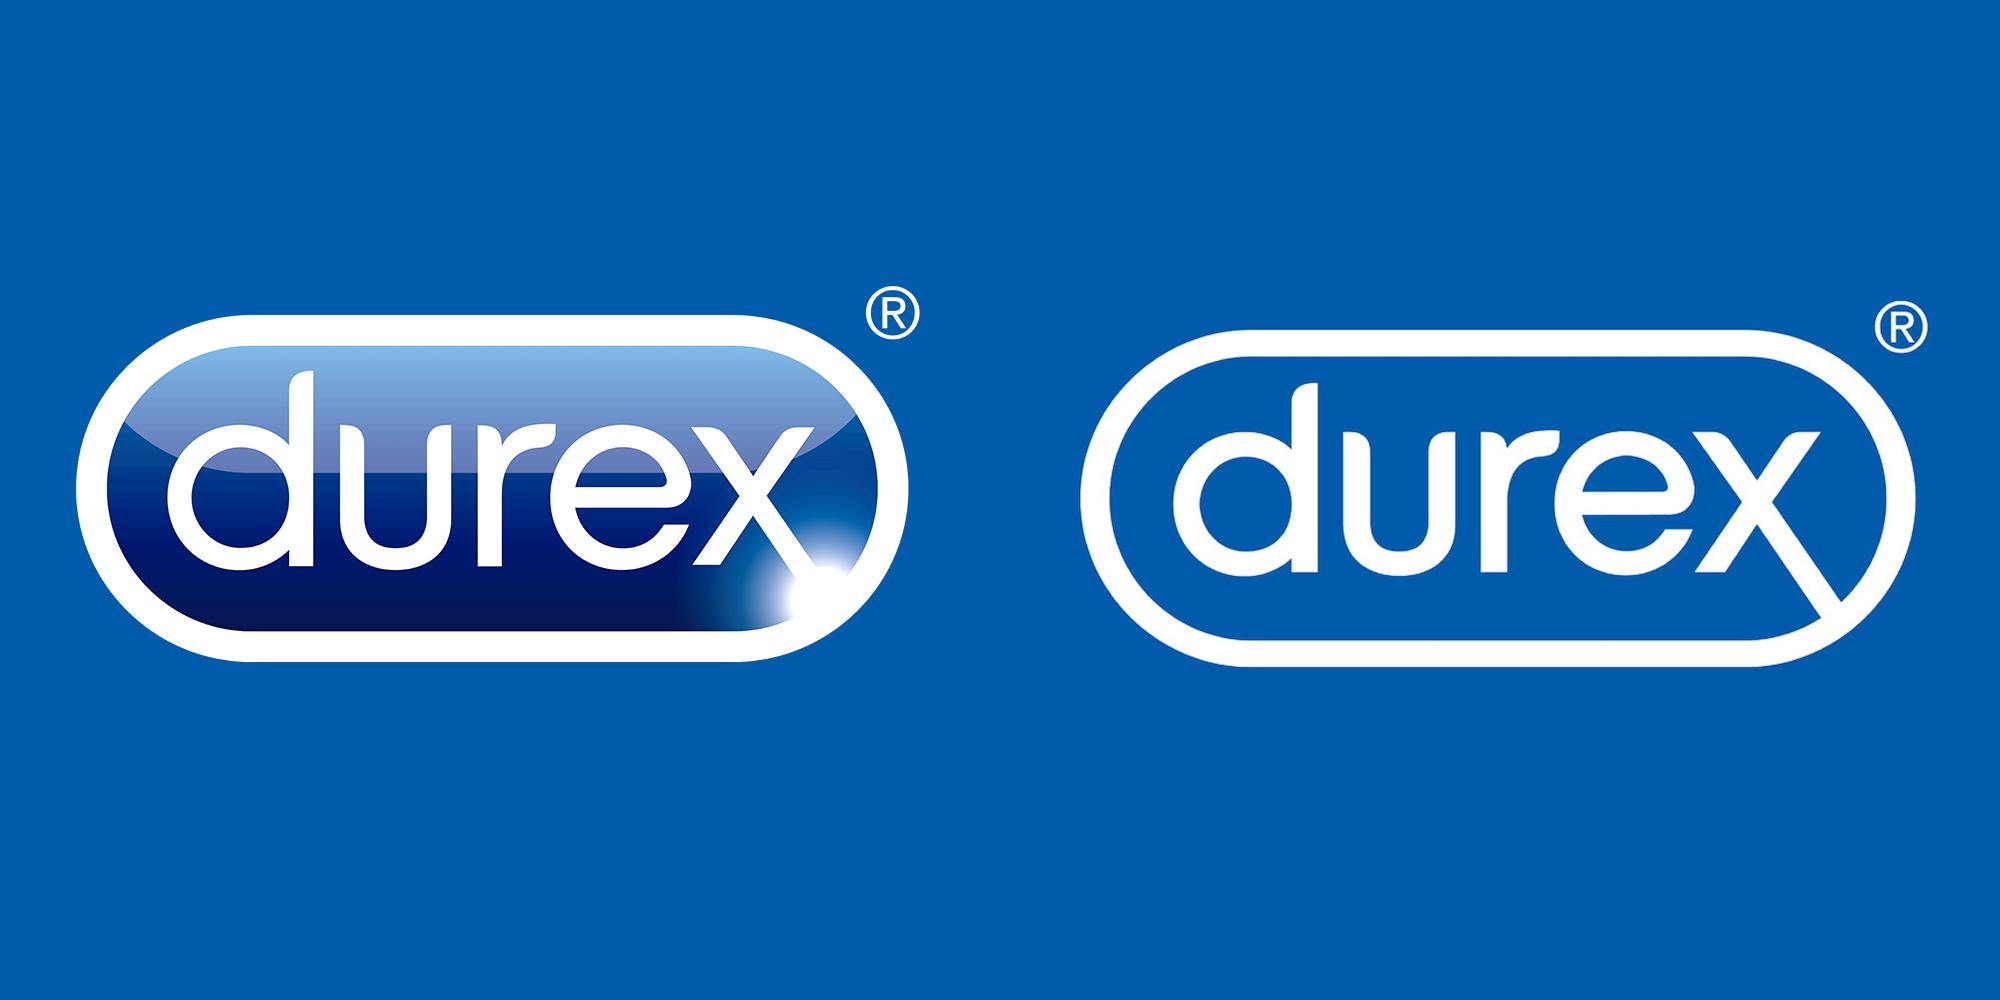 Durex logos